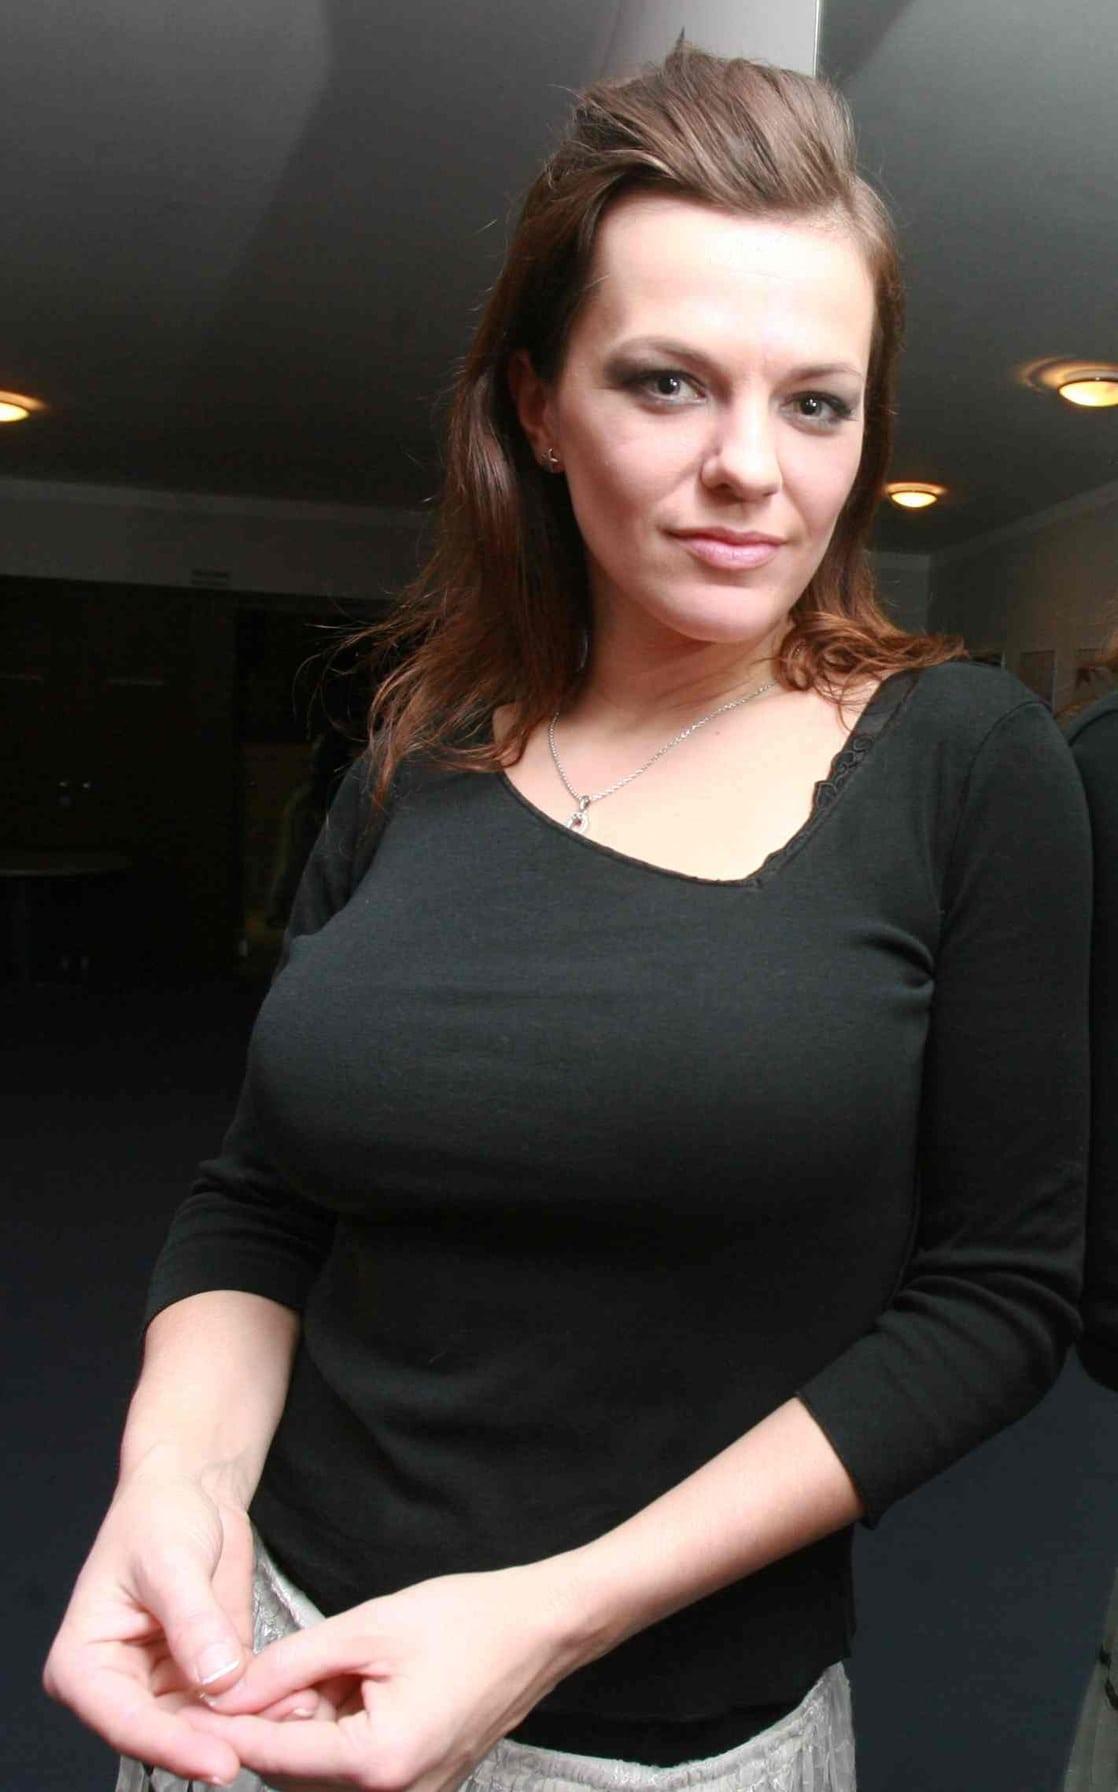 Picture of Marta Jandova